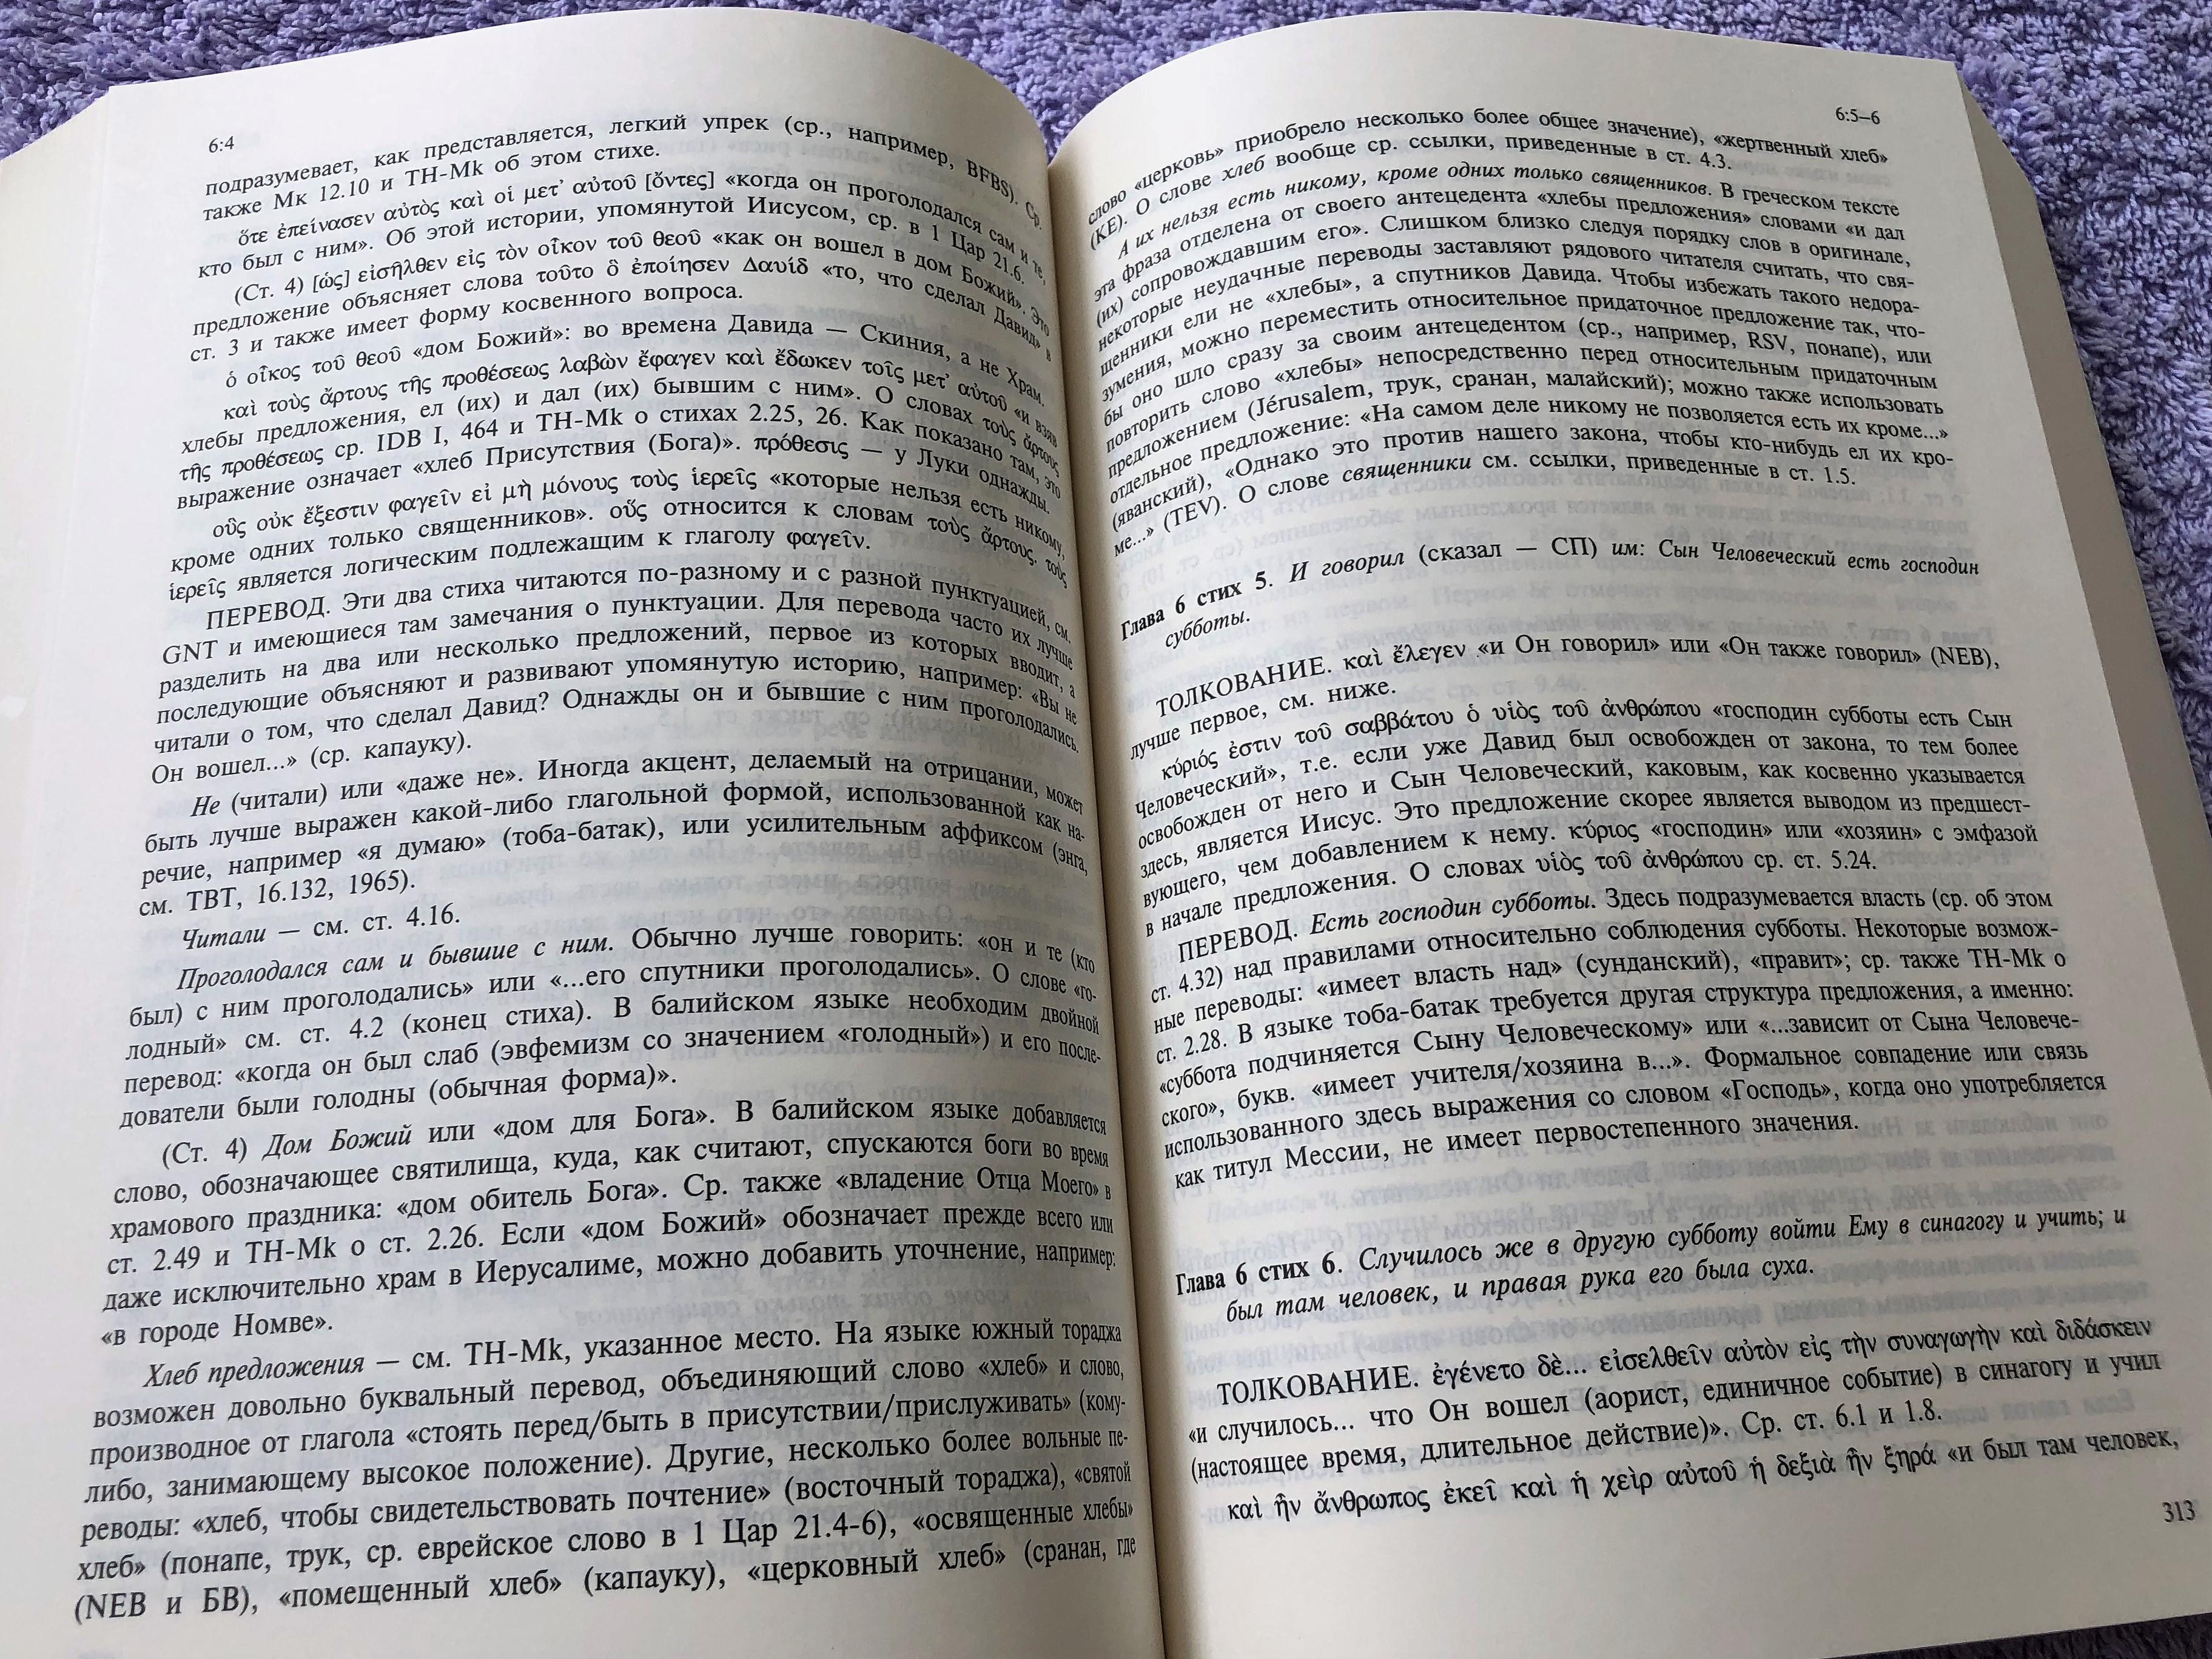 russian-language-edition-of-the-helps-for-bible-translators-a-translator-s-handbook-on-the-gospel-of-luke-10-.jpg